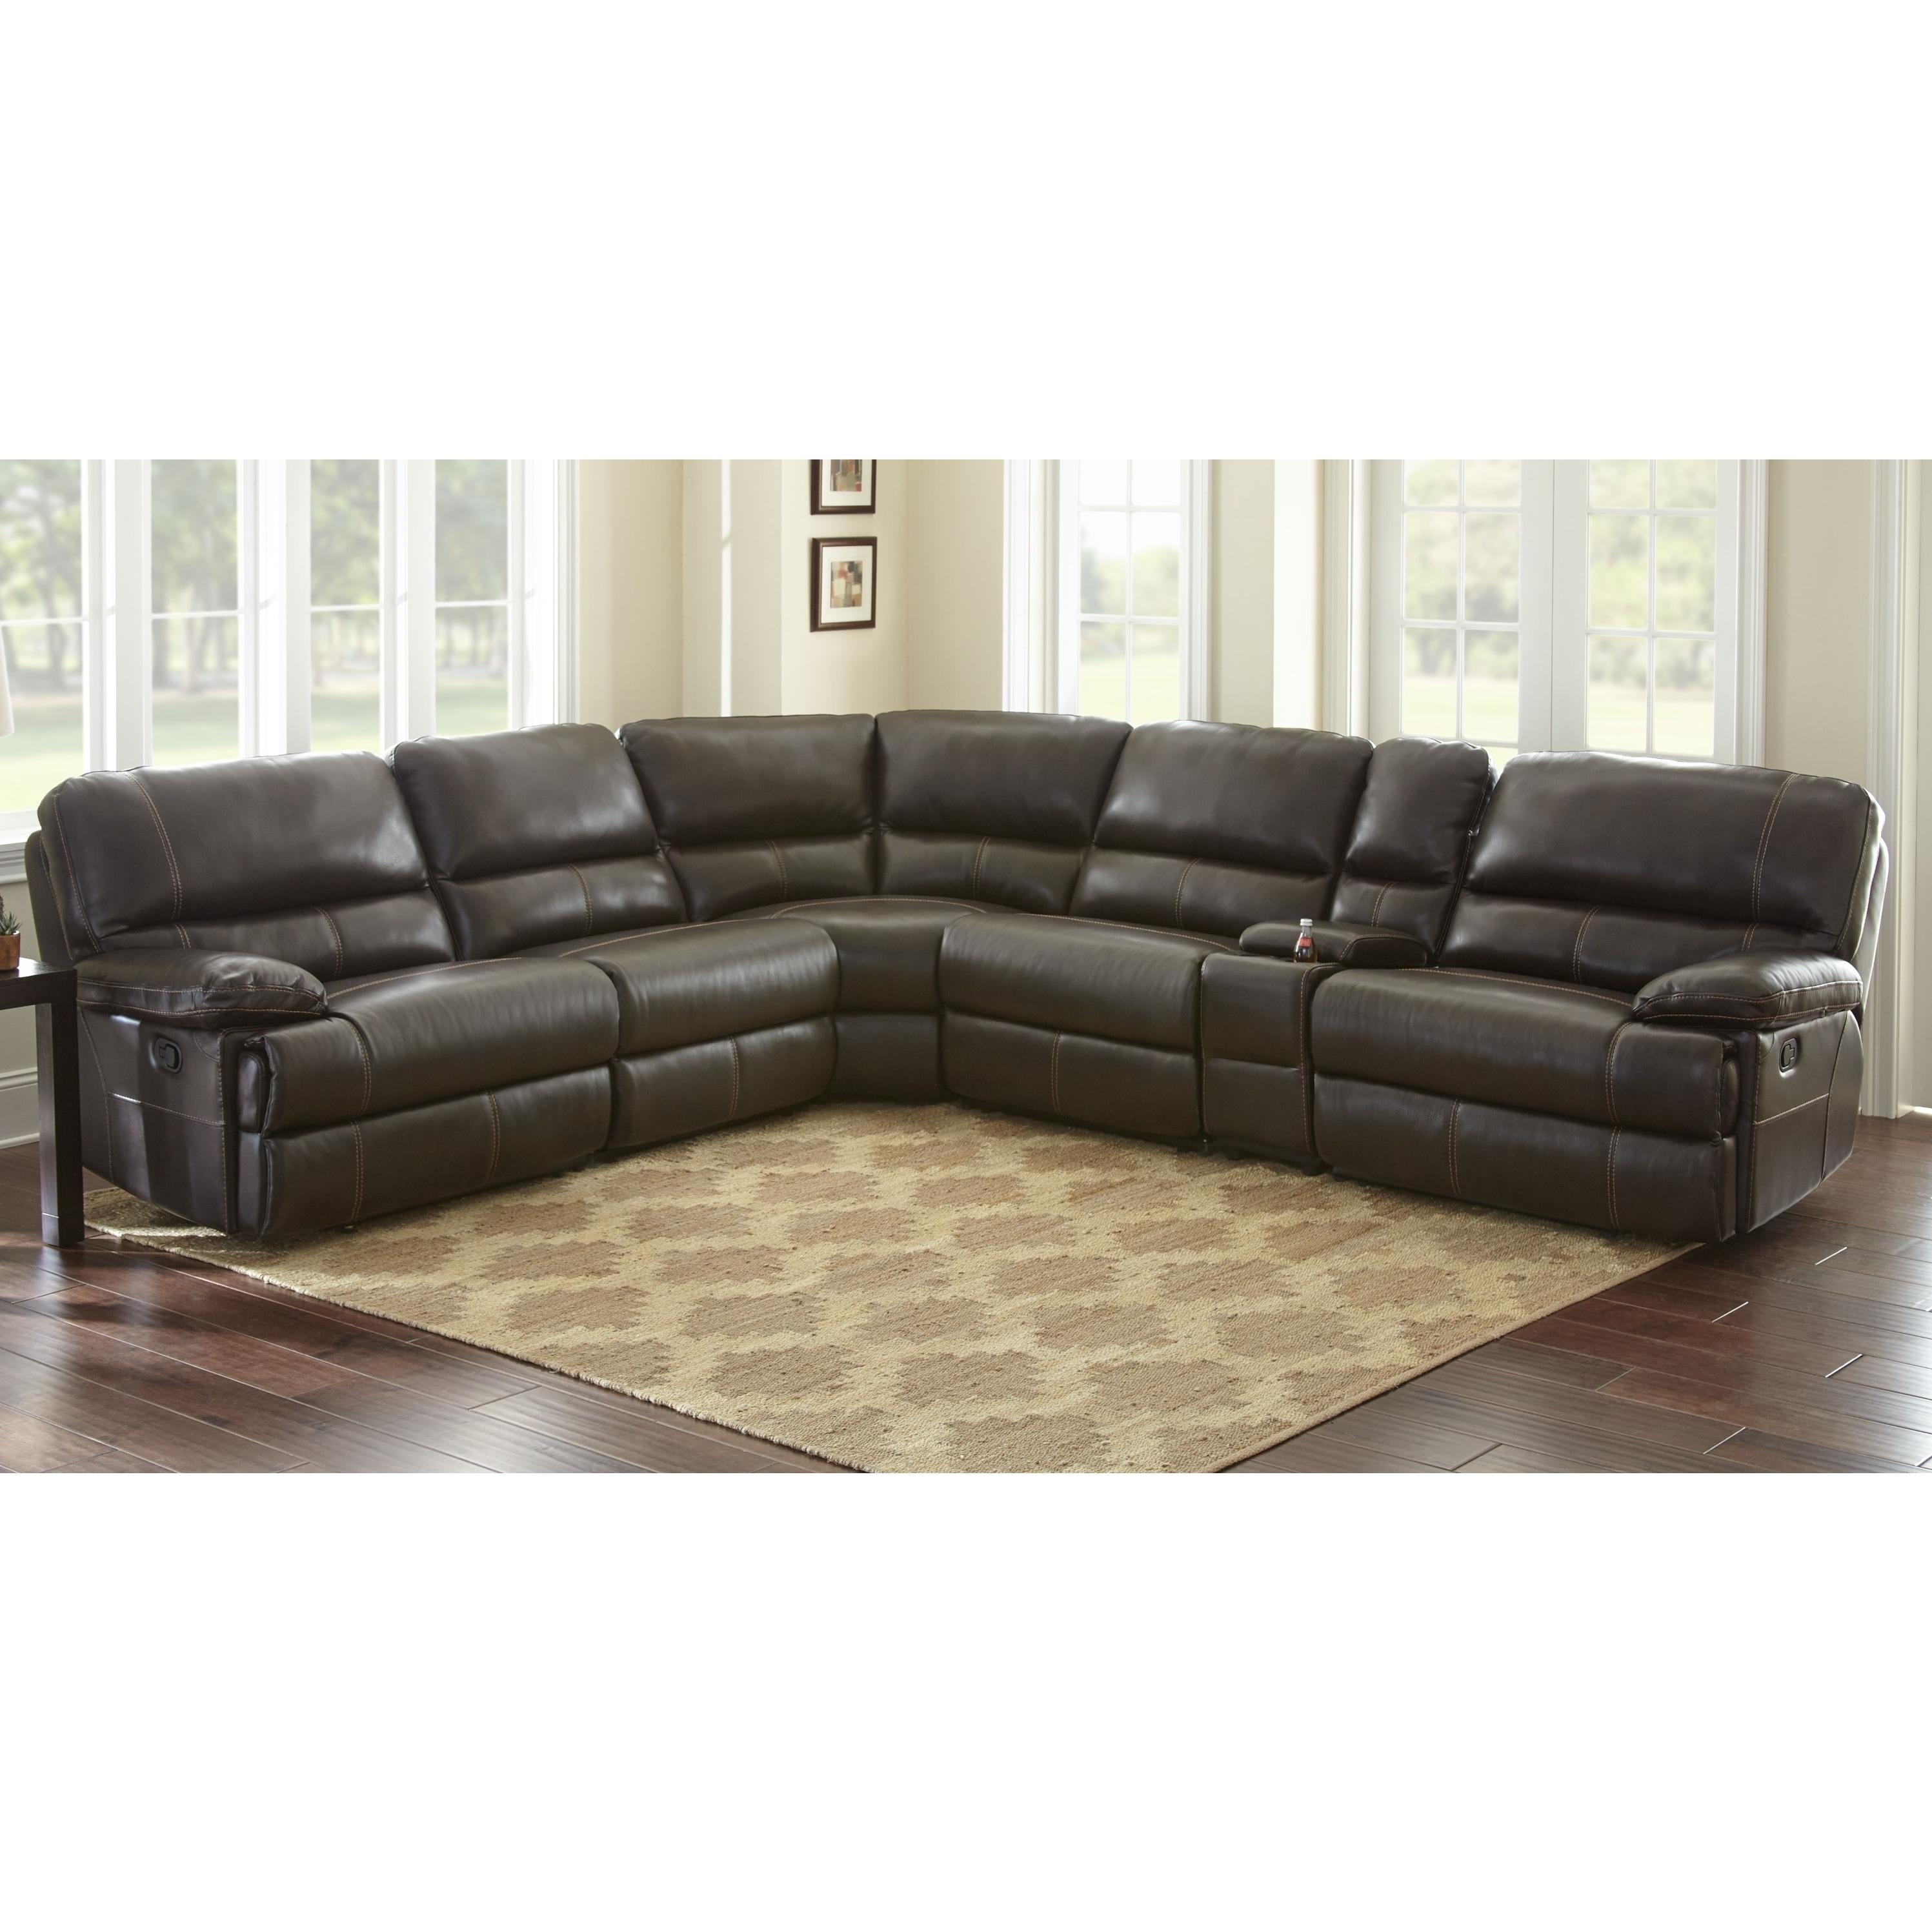 Good Rimini Top Grain Leather Sectional Sofa By Greyson Living